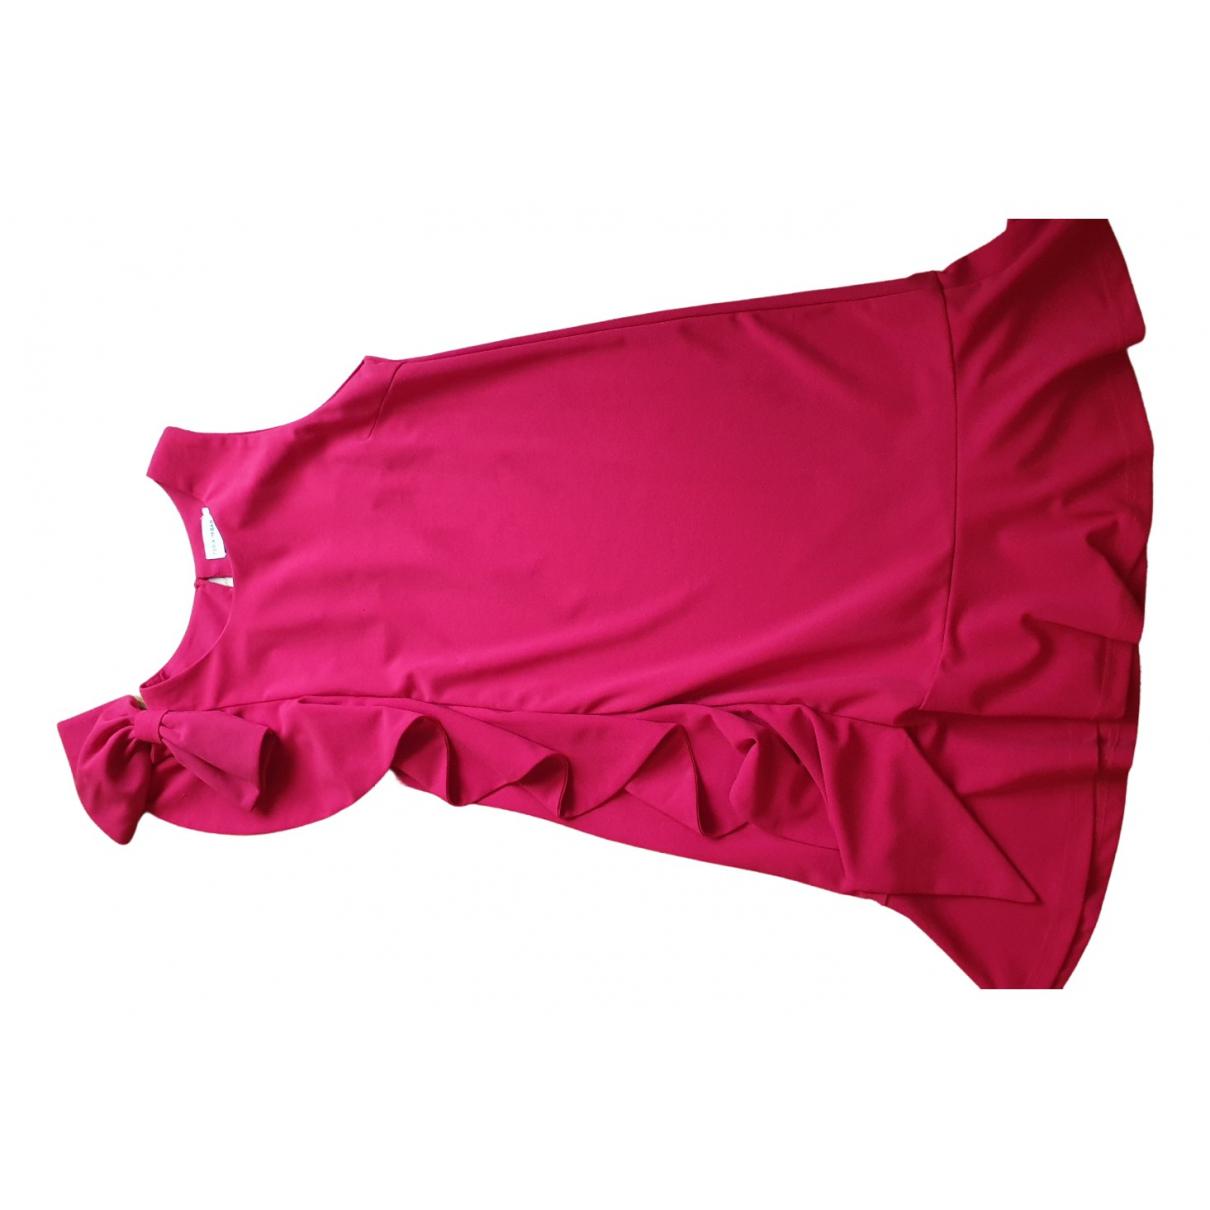 Teria Yabar \N Kleid in  Rot Polyester